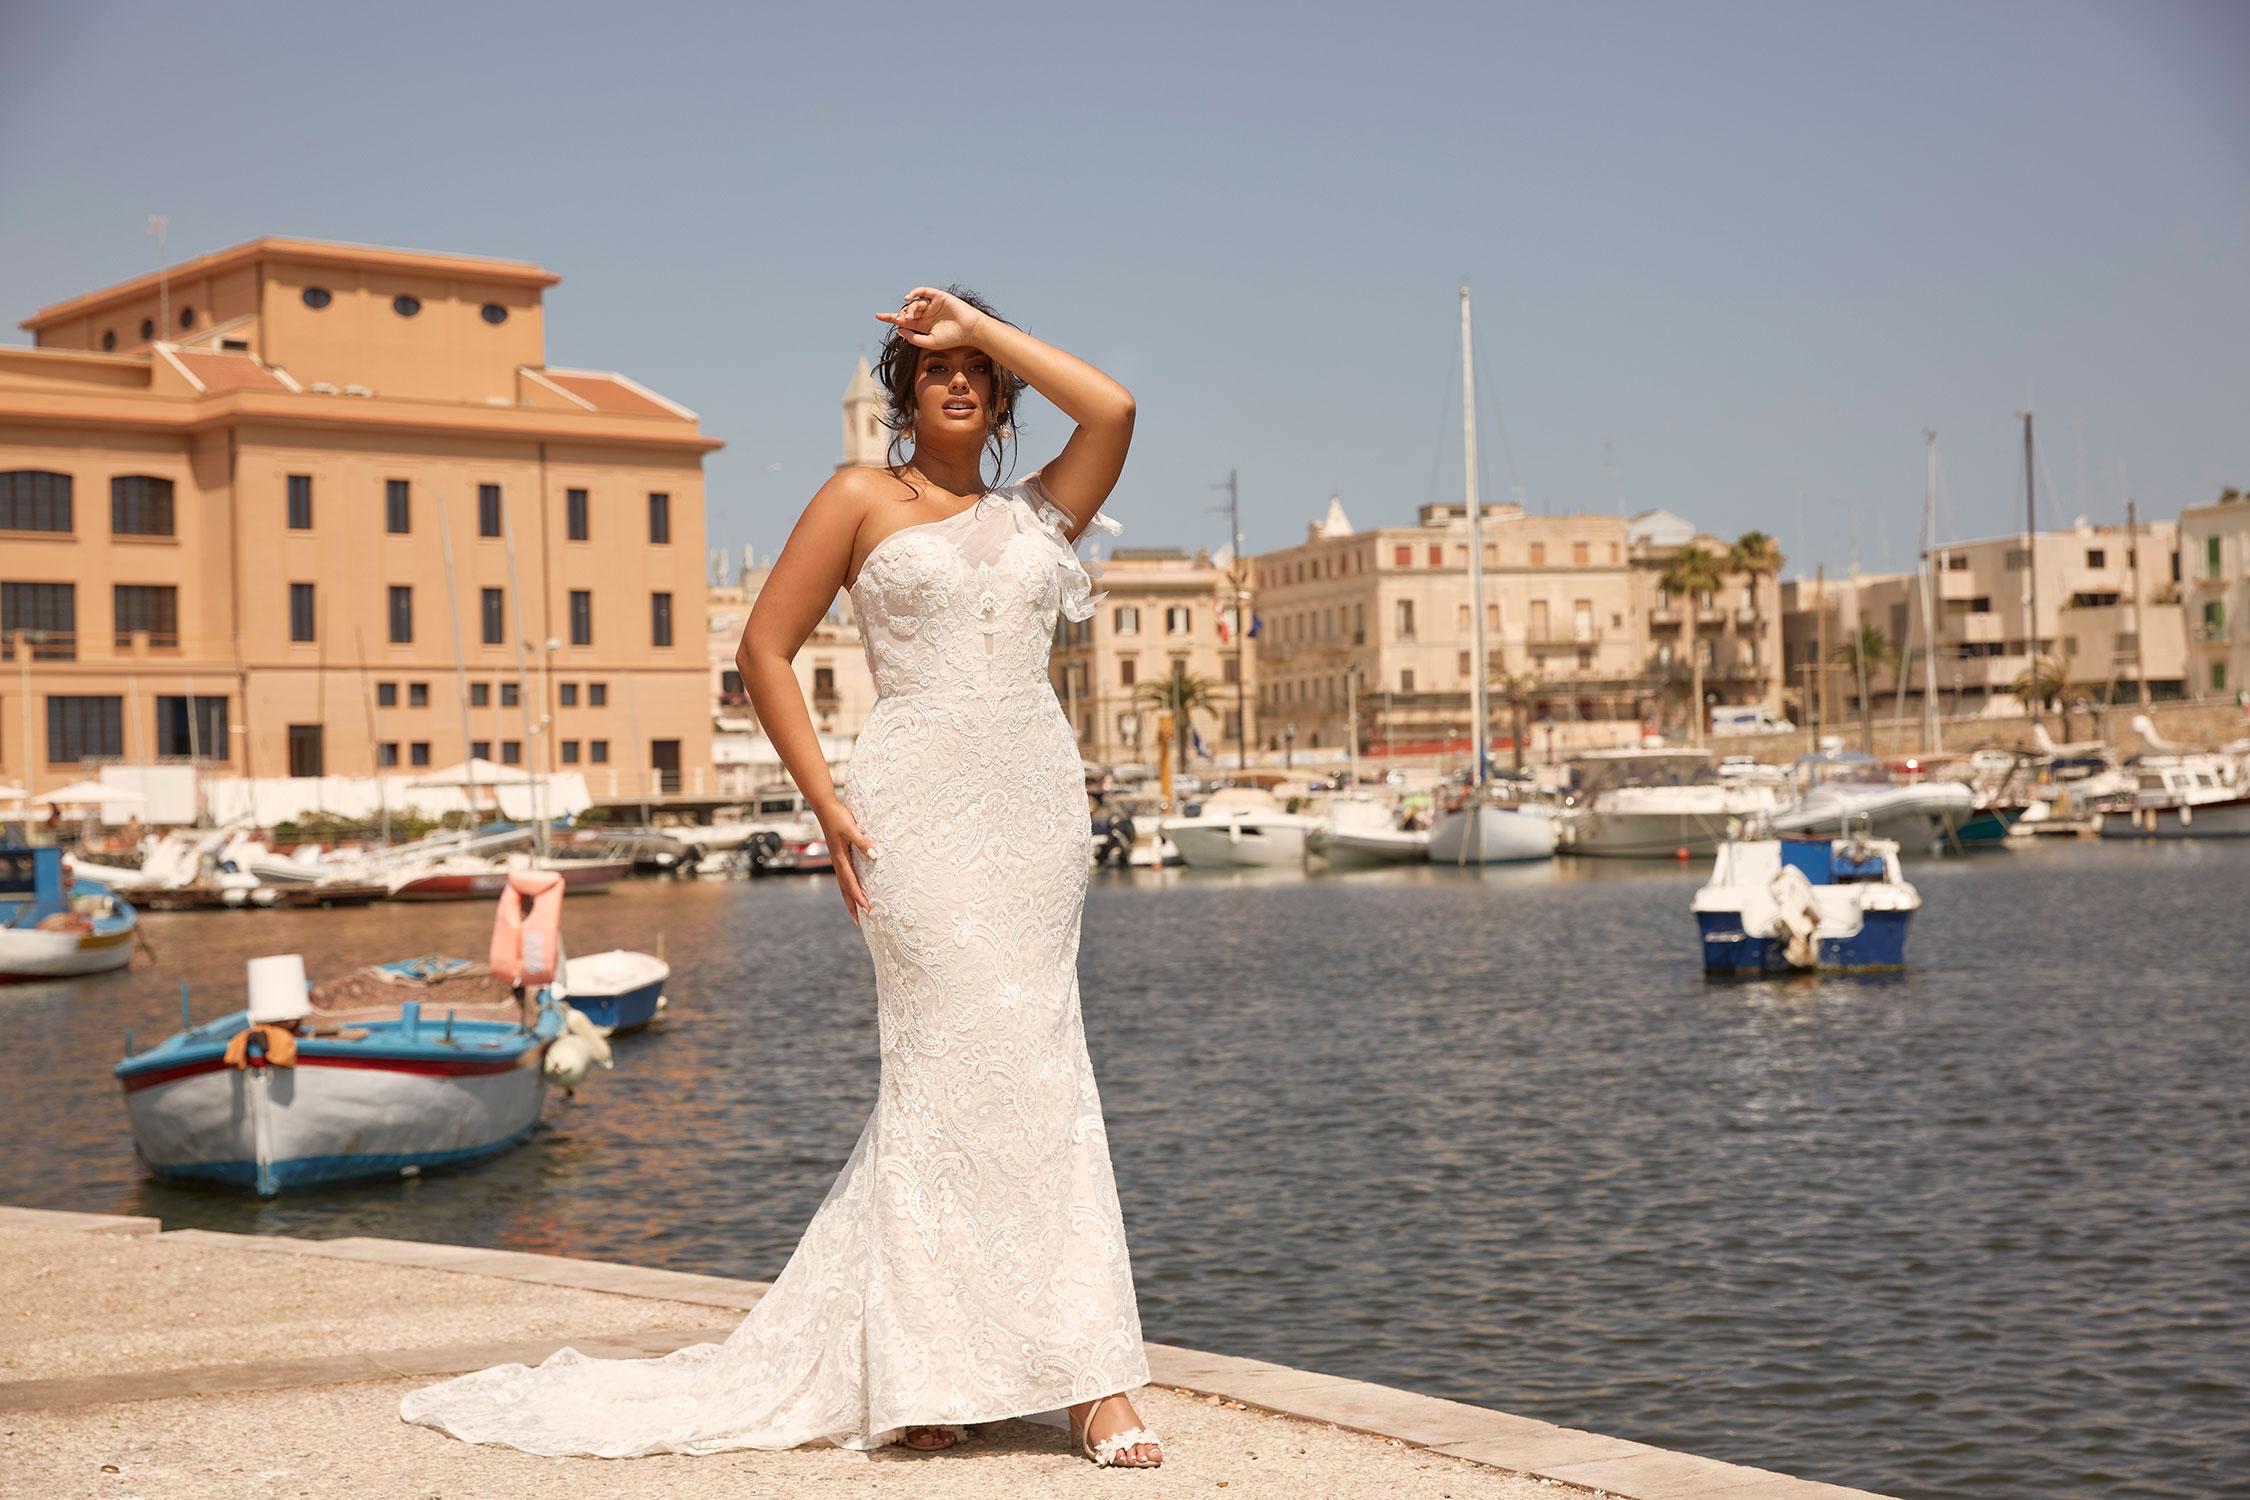 Miami Ml13990 Full Length Floral Lace With Single Shoulder Strap Wedding Dress Madi Lane Bridal2